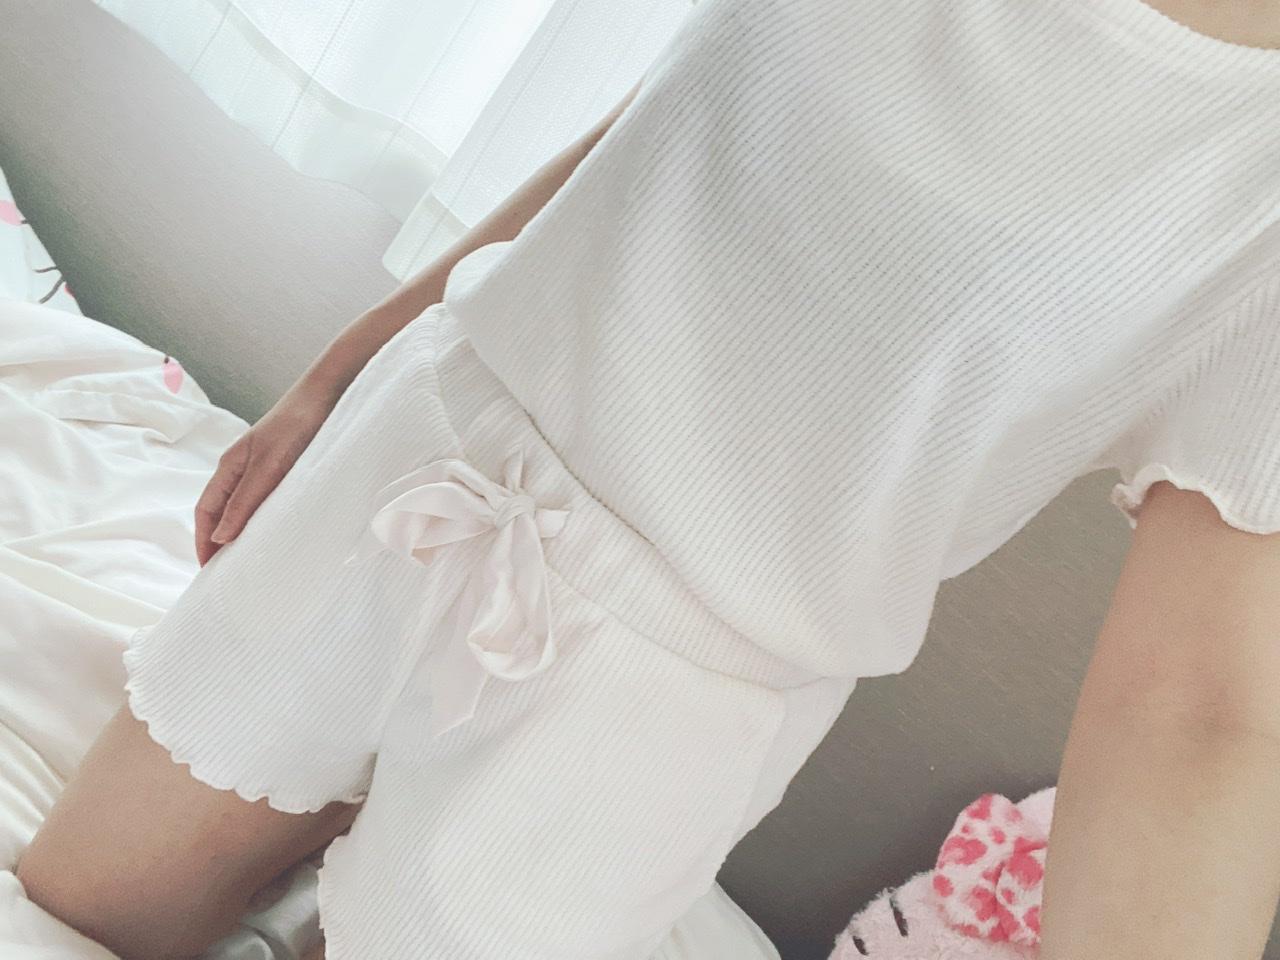 【GU】大絶賛の嵐!新作パジャマが史上最高の可愛さ♡《ラウンジセット¥1,490》は絶対買い!_7